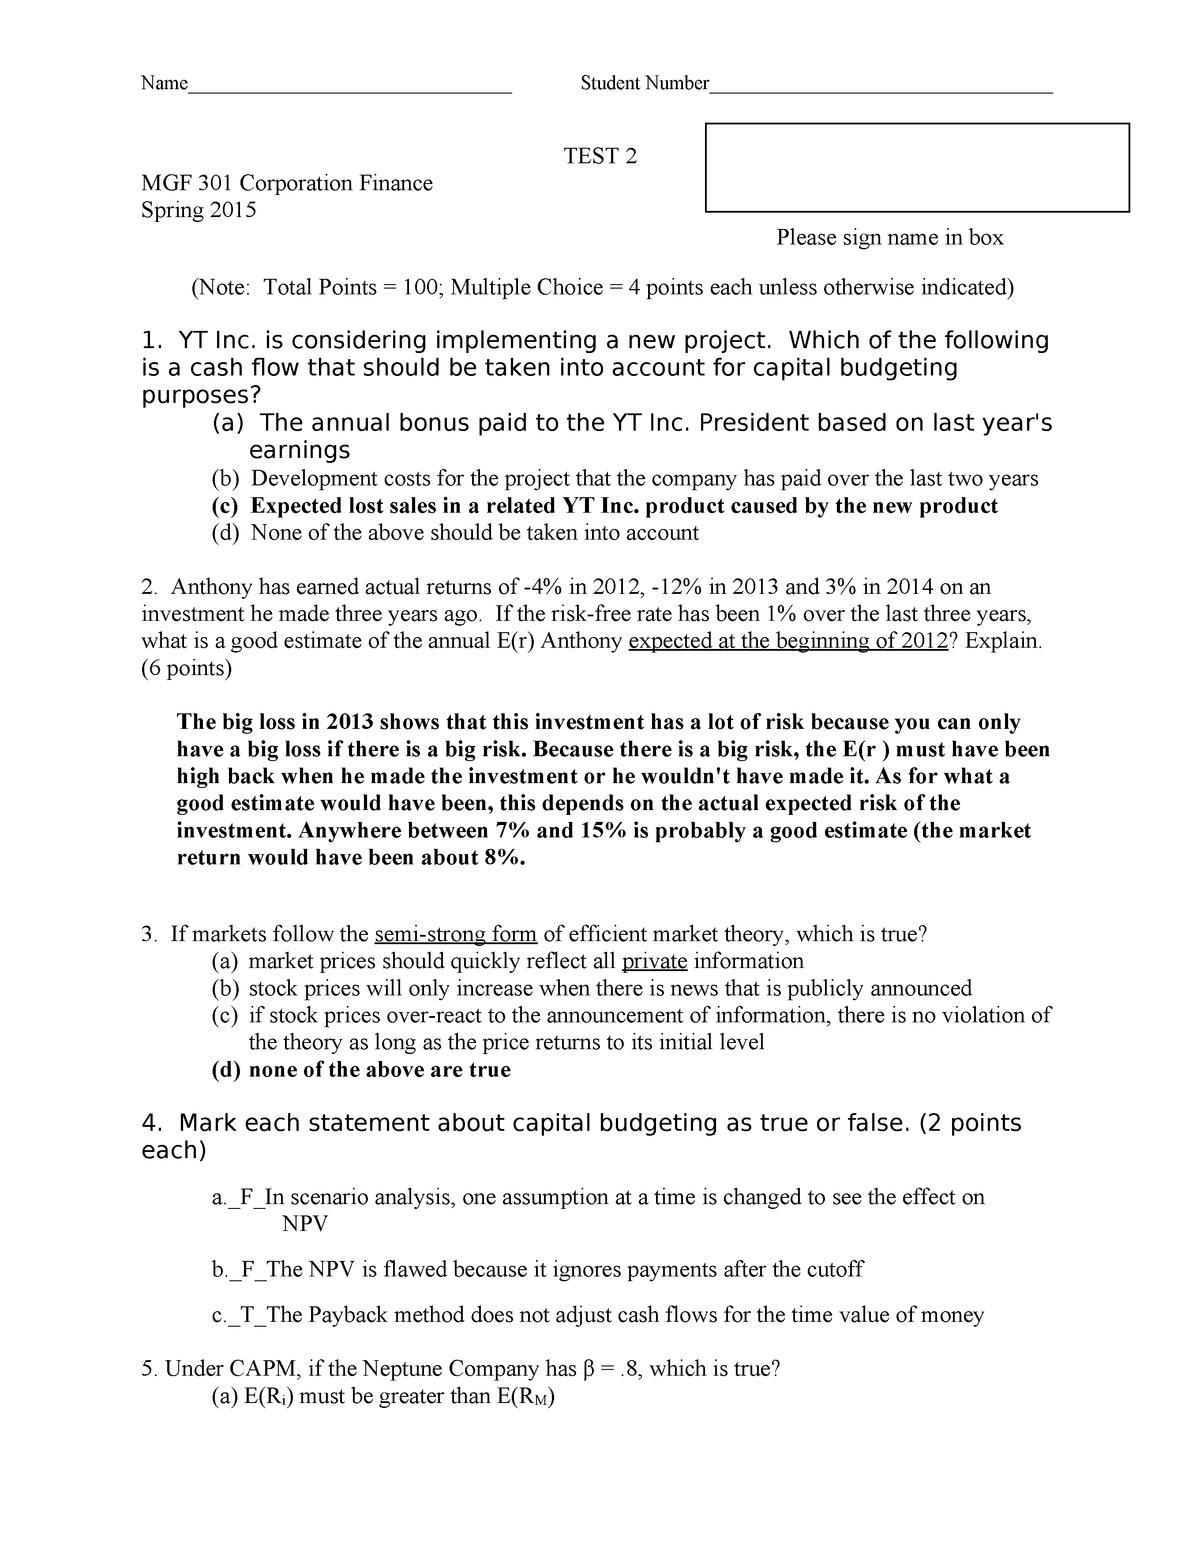 Exam 2015 - MGF 301: Corporation Finance - StuDocu